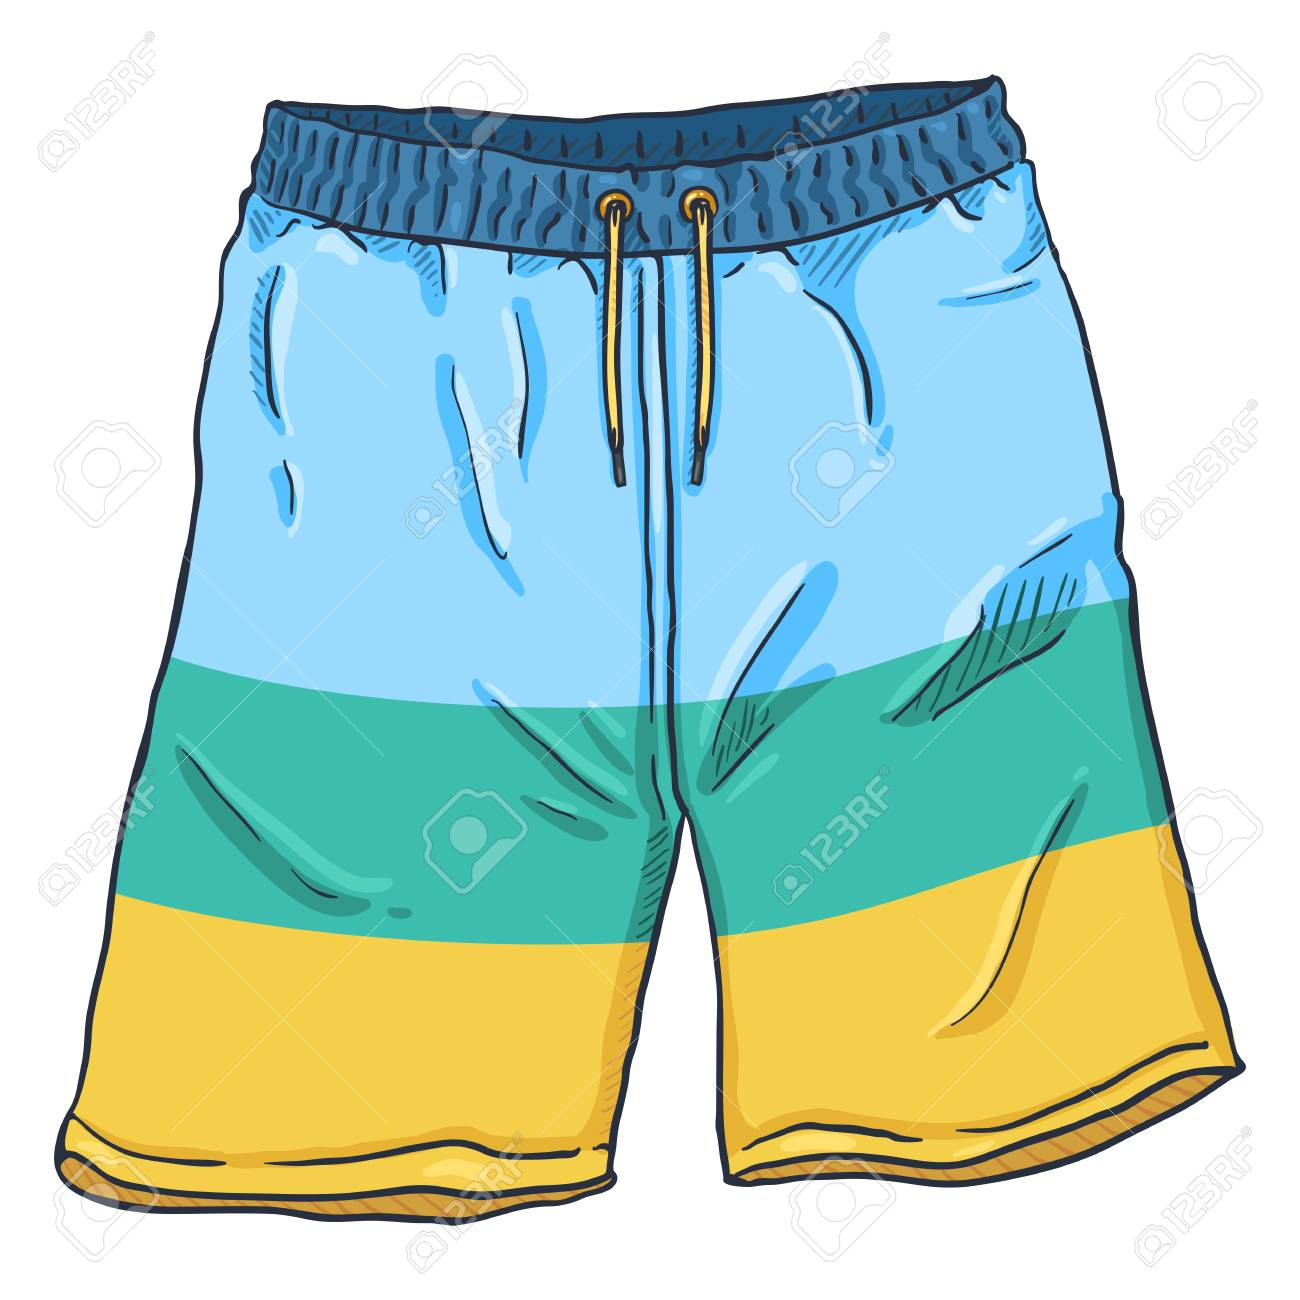 Vector Cartoon Illustration - Beach Colorful Swimming Shorts - 111849286